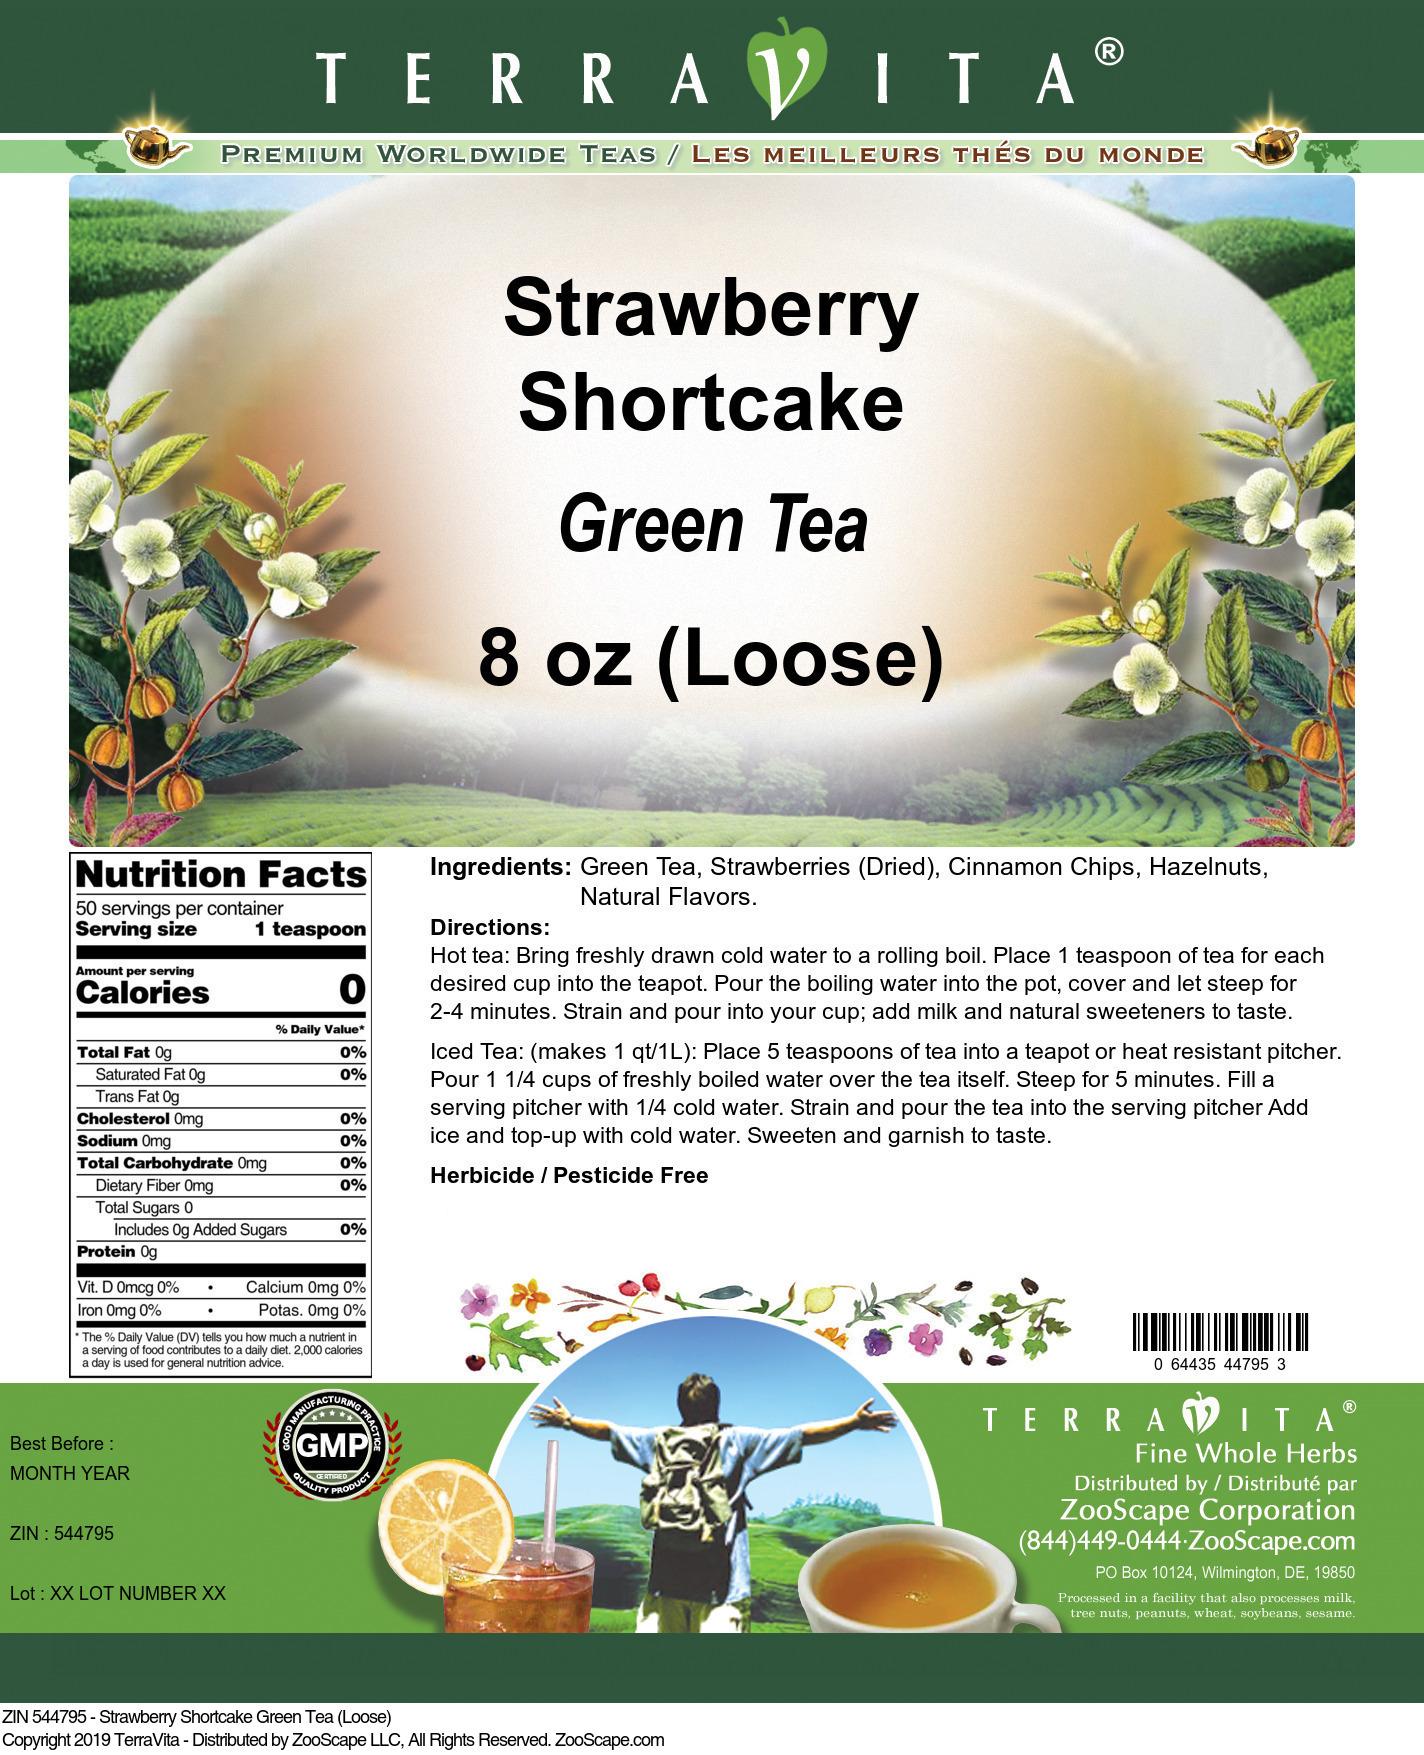 Strawberry Shortcake Green Tea